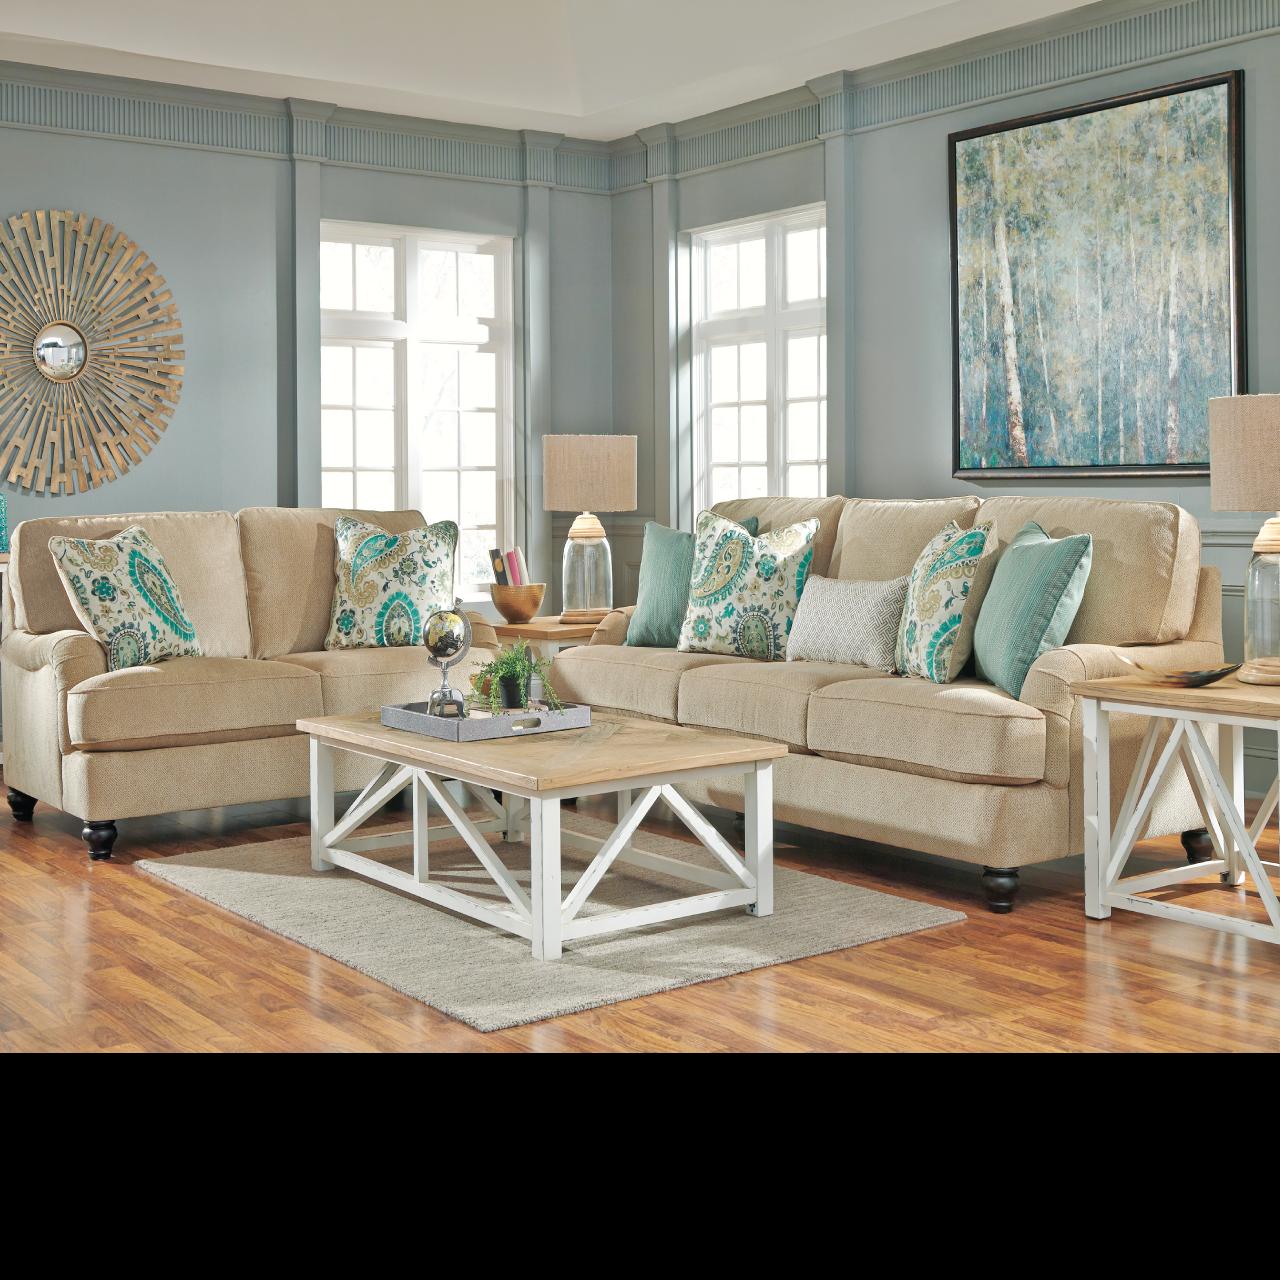 coastal living room ideas: lochian sofa by ashley furniture at